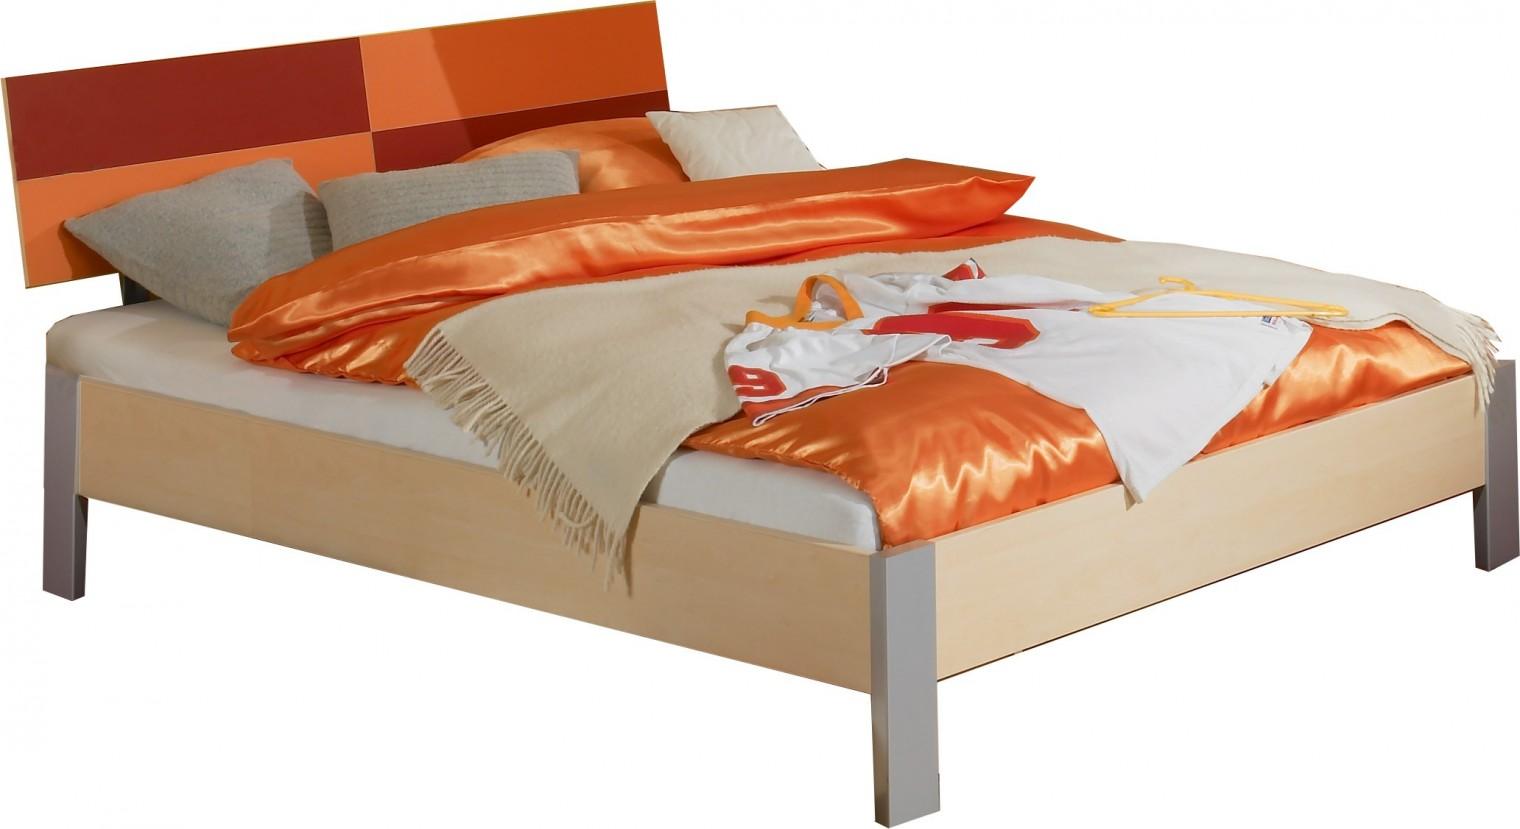 Klasická posteľ Sunny - Posteľ, 140x200 cm (červenooranžová)